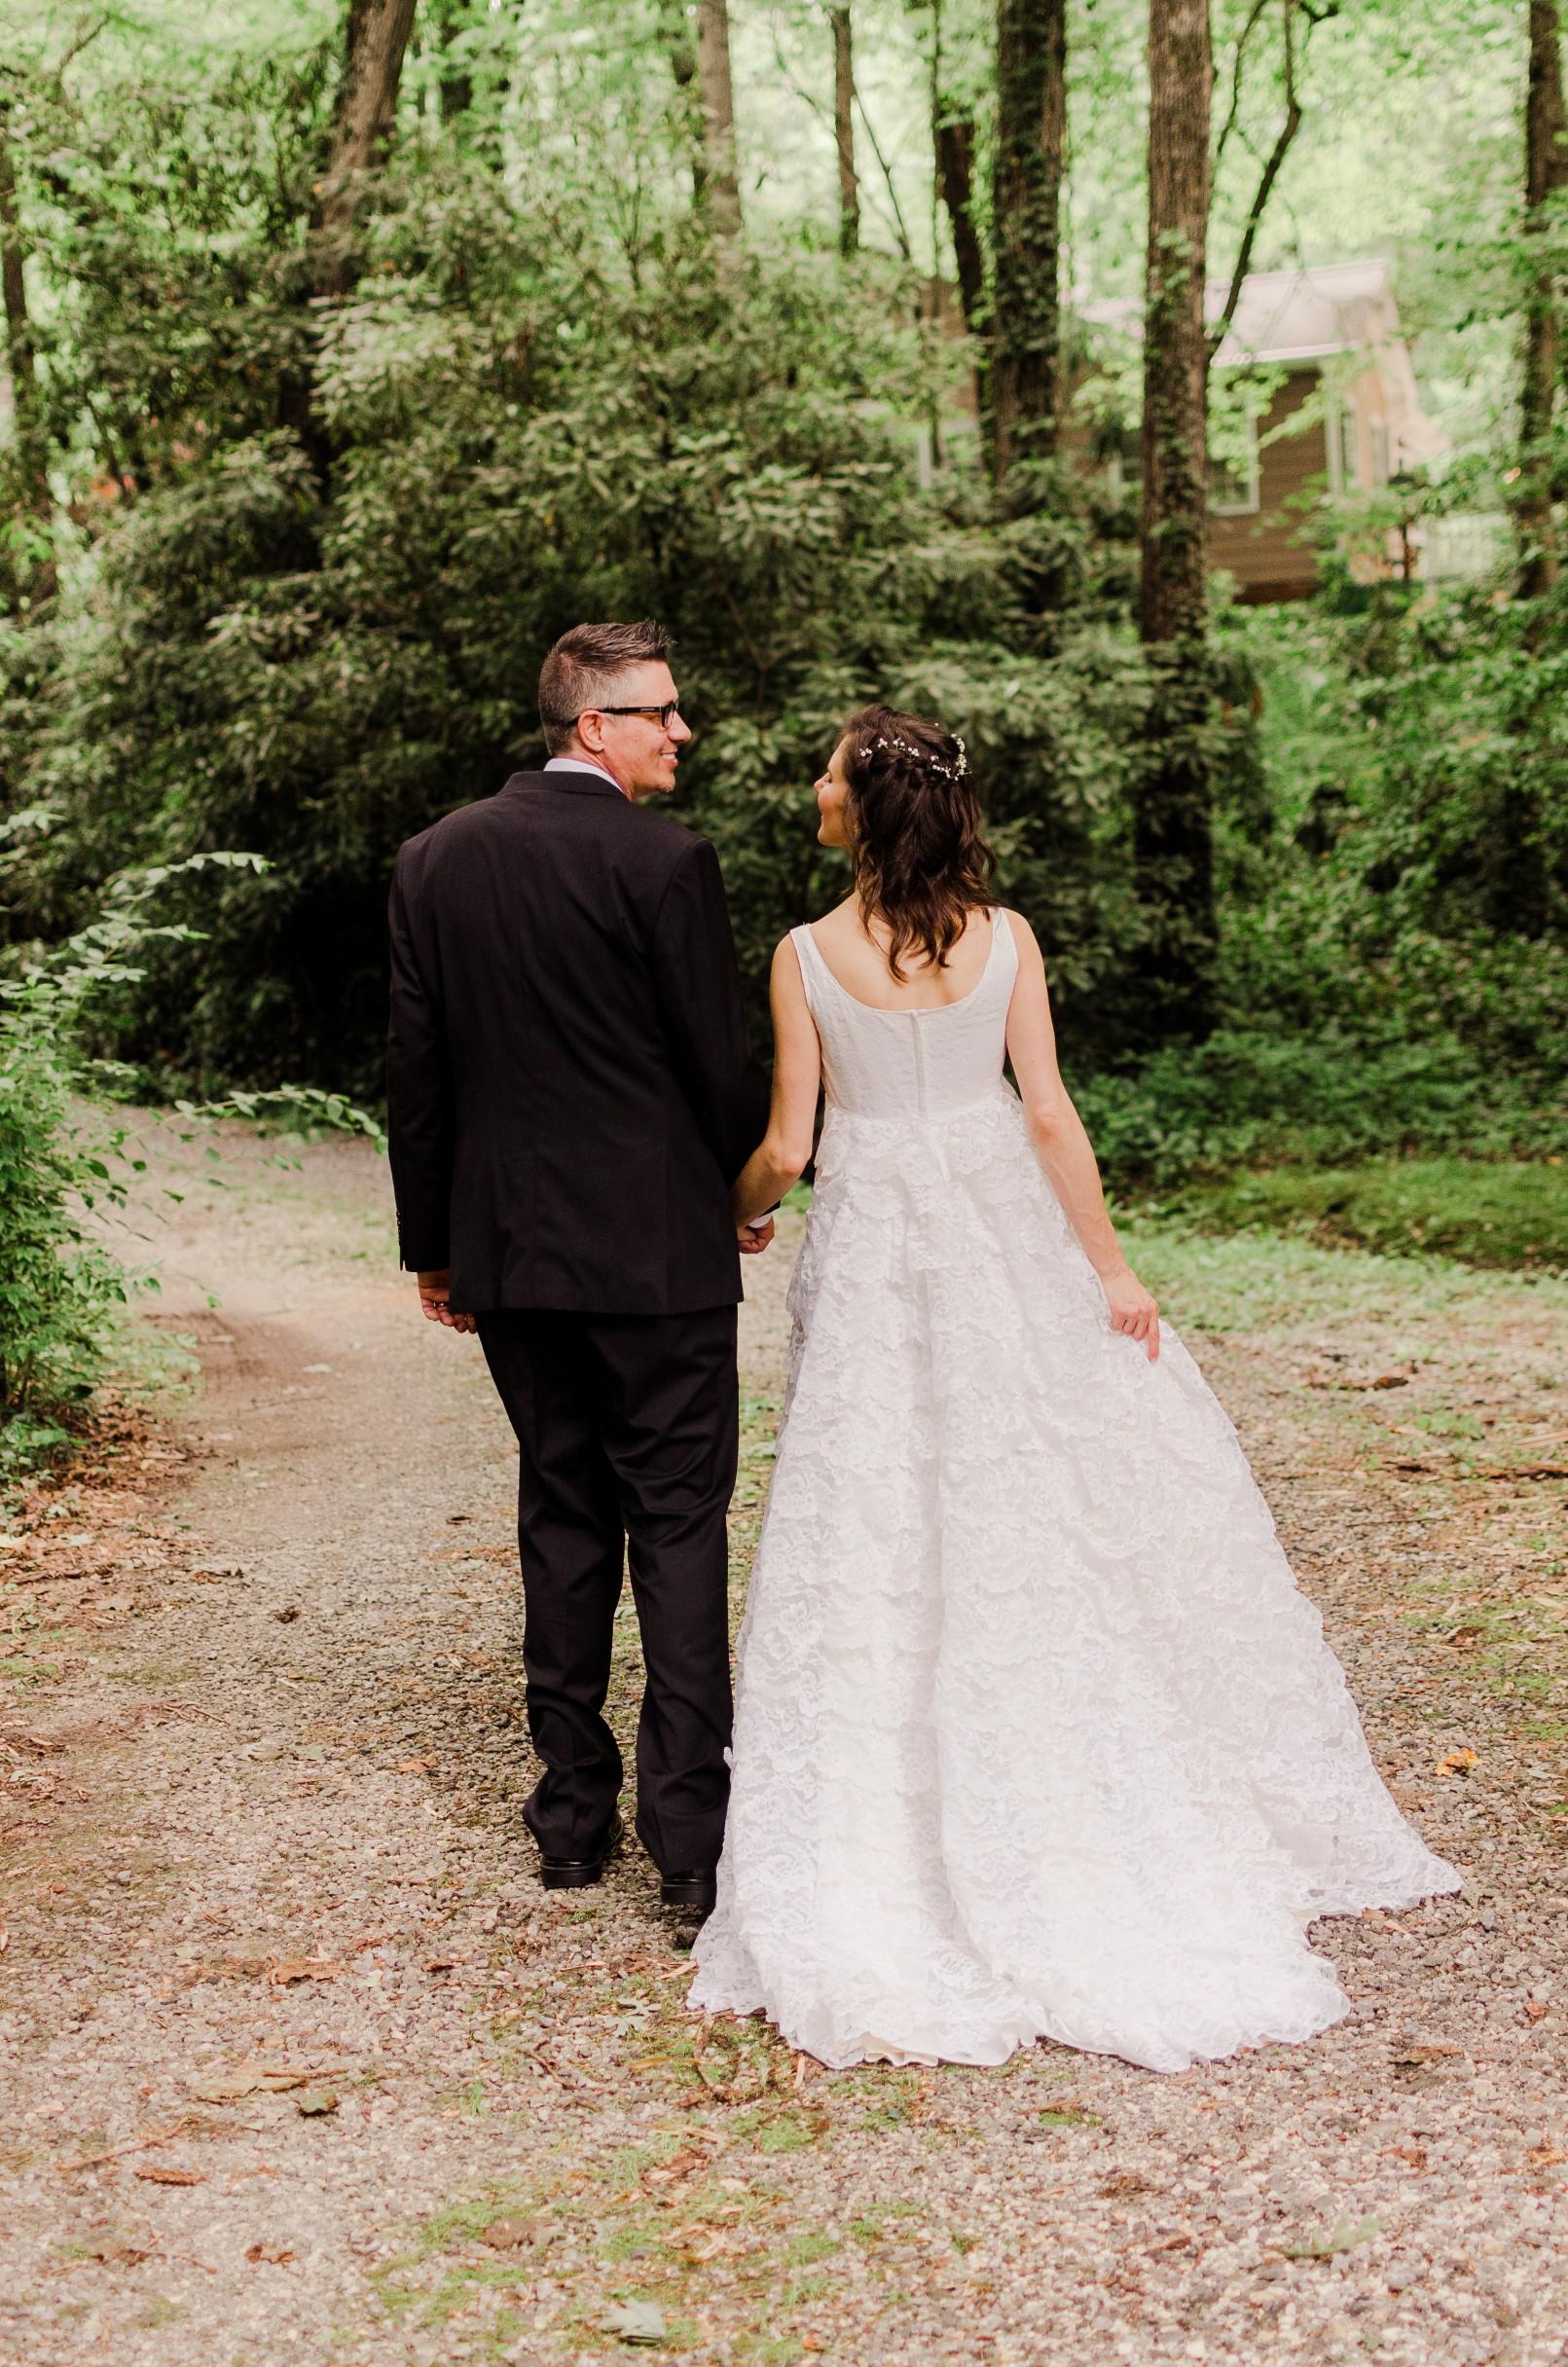 wedding-photo-wooton.jpg.